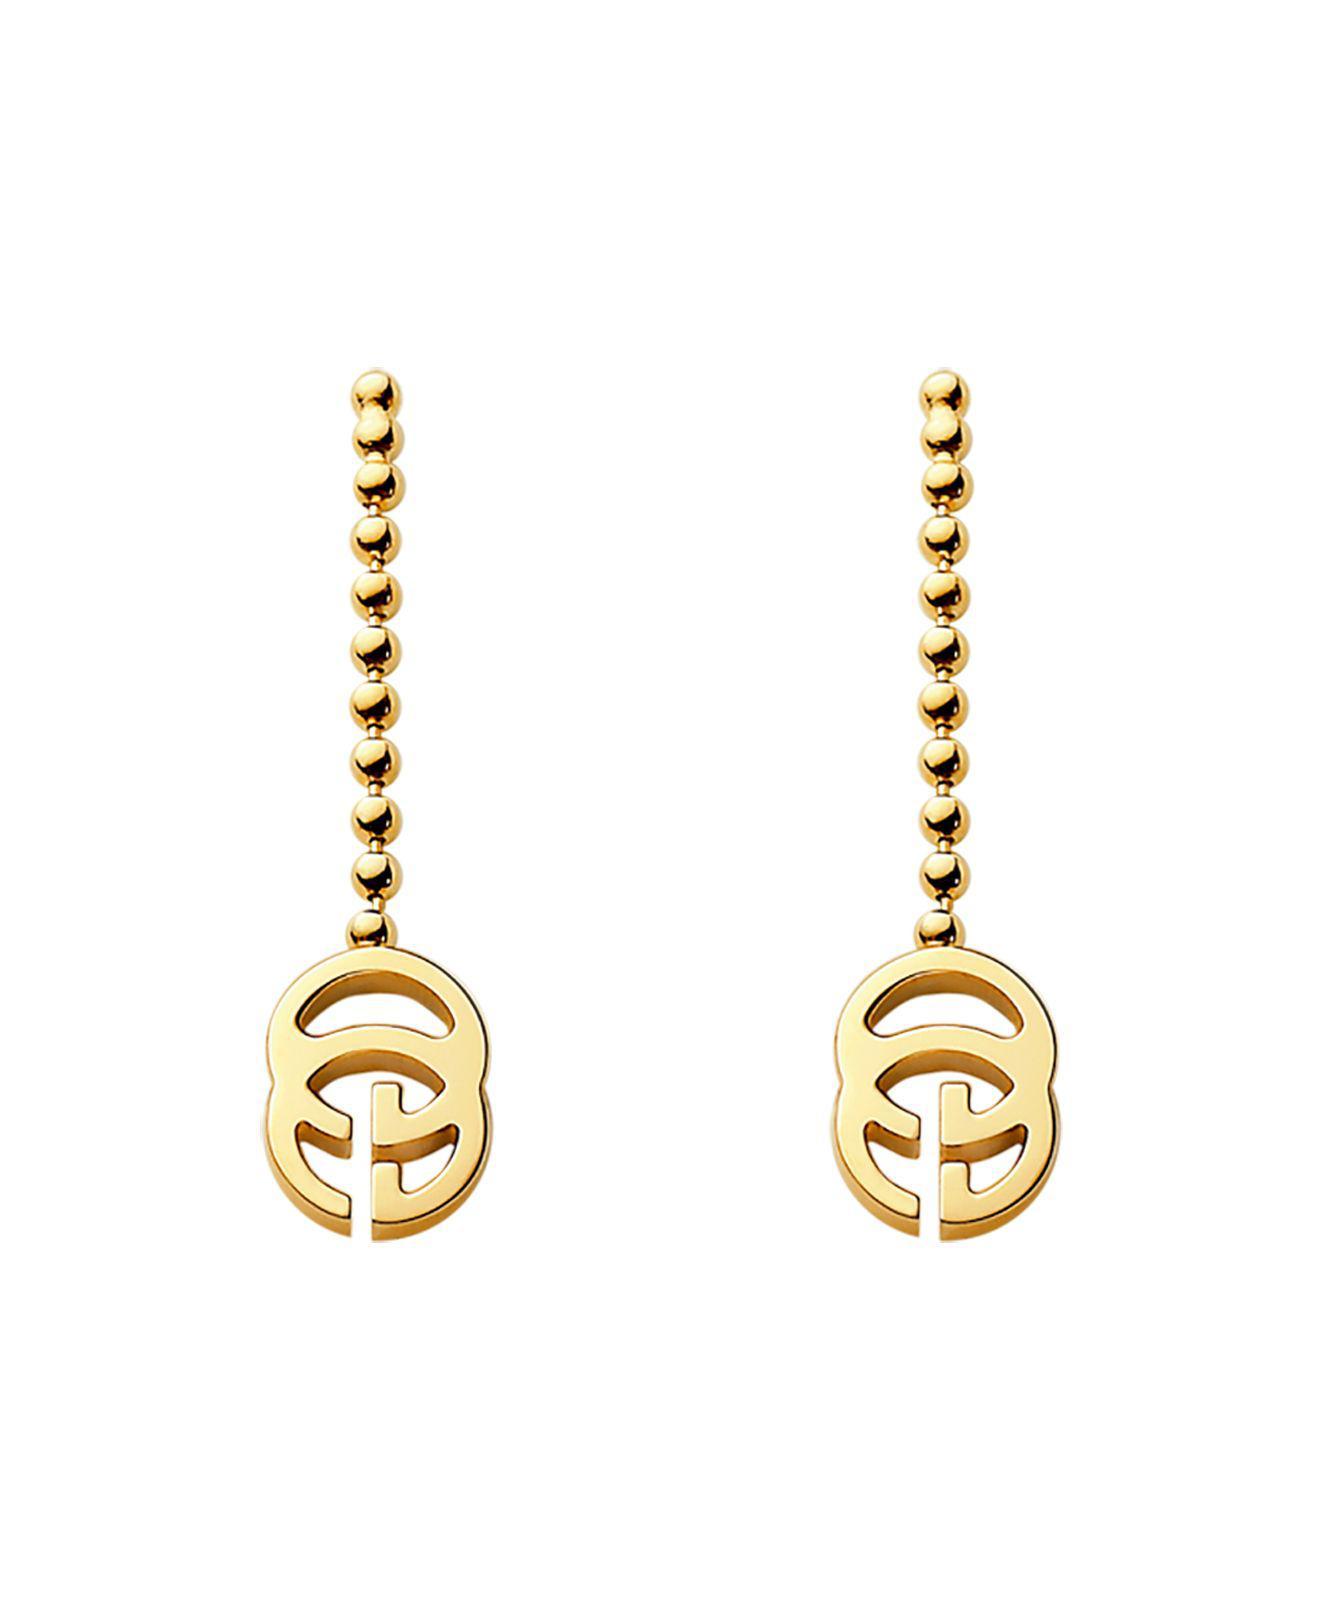 c8867883187f1b Gucci 18k Yellow Gold Running G Earrings in Metallic - Lyst